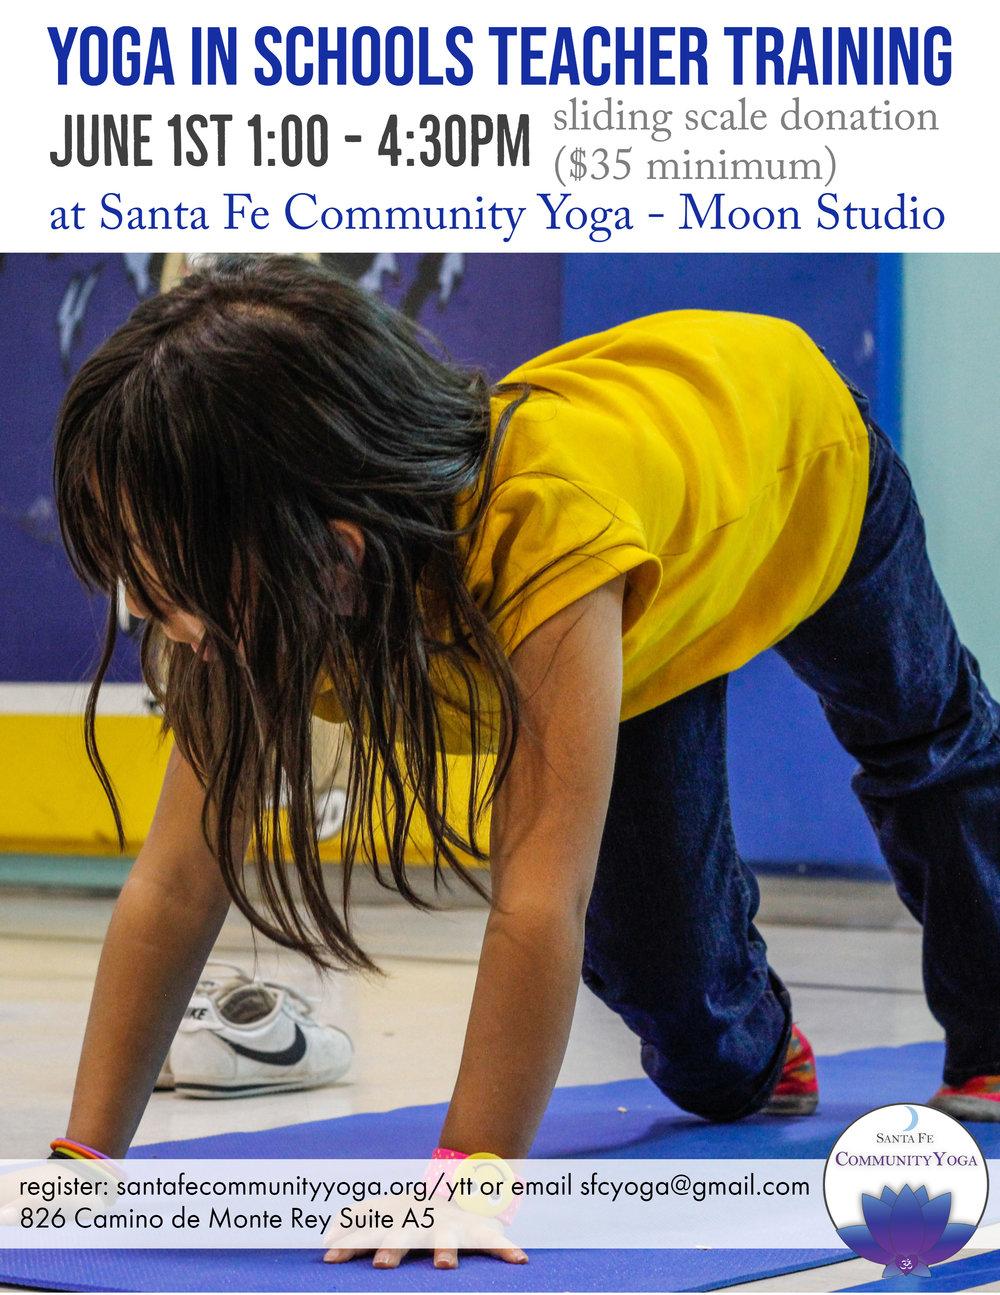 Yoga in Schools Teacher Training.jpg